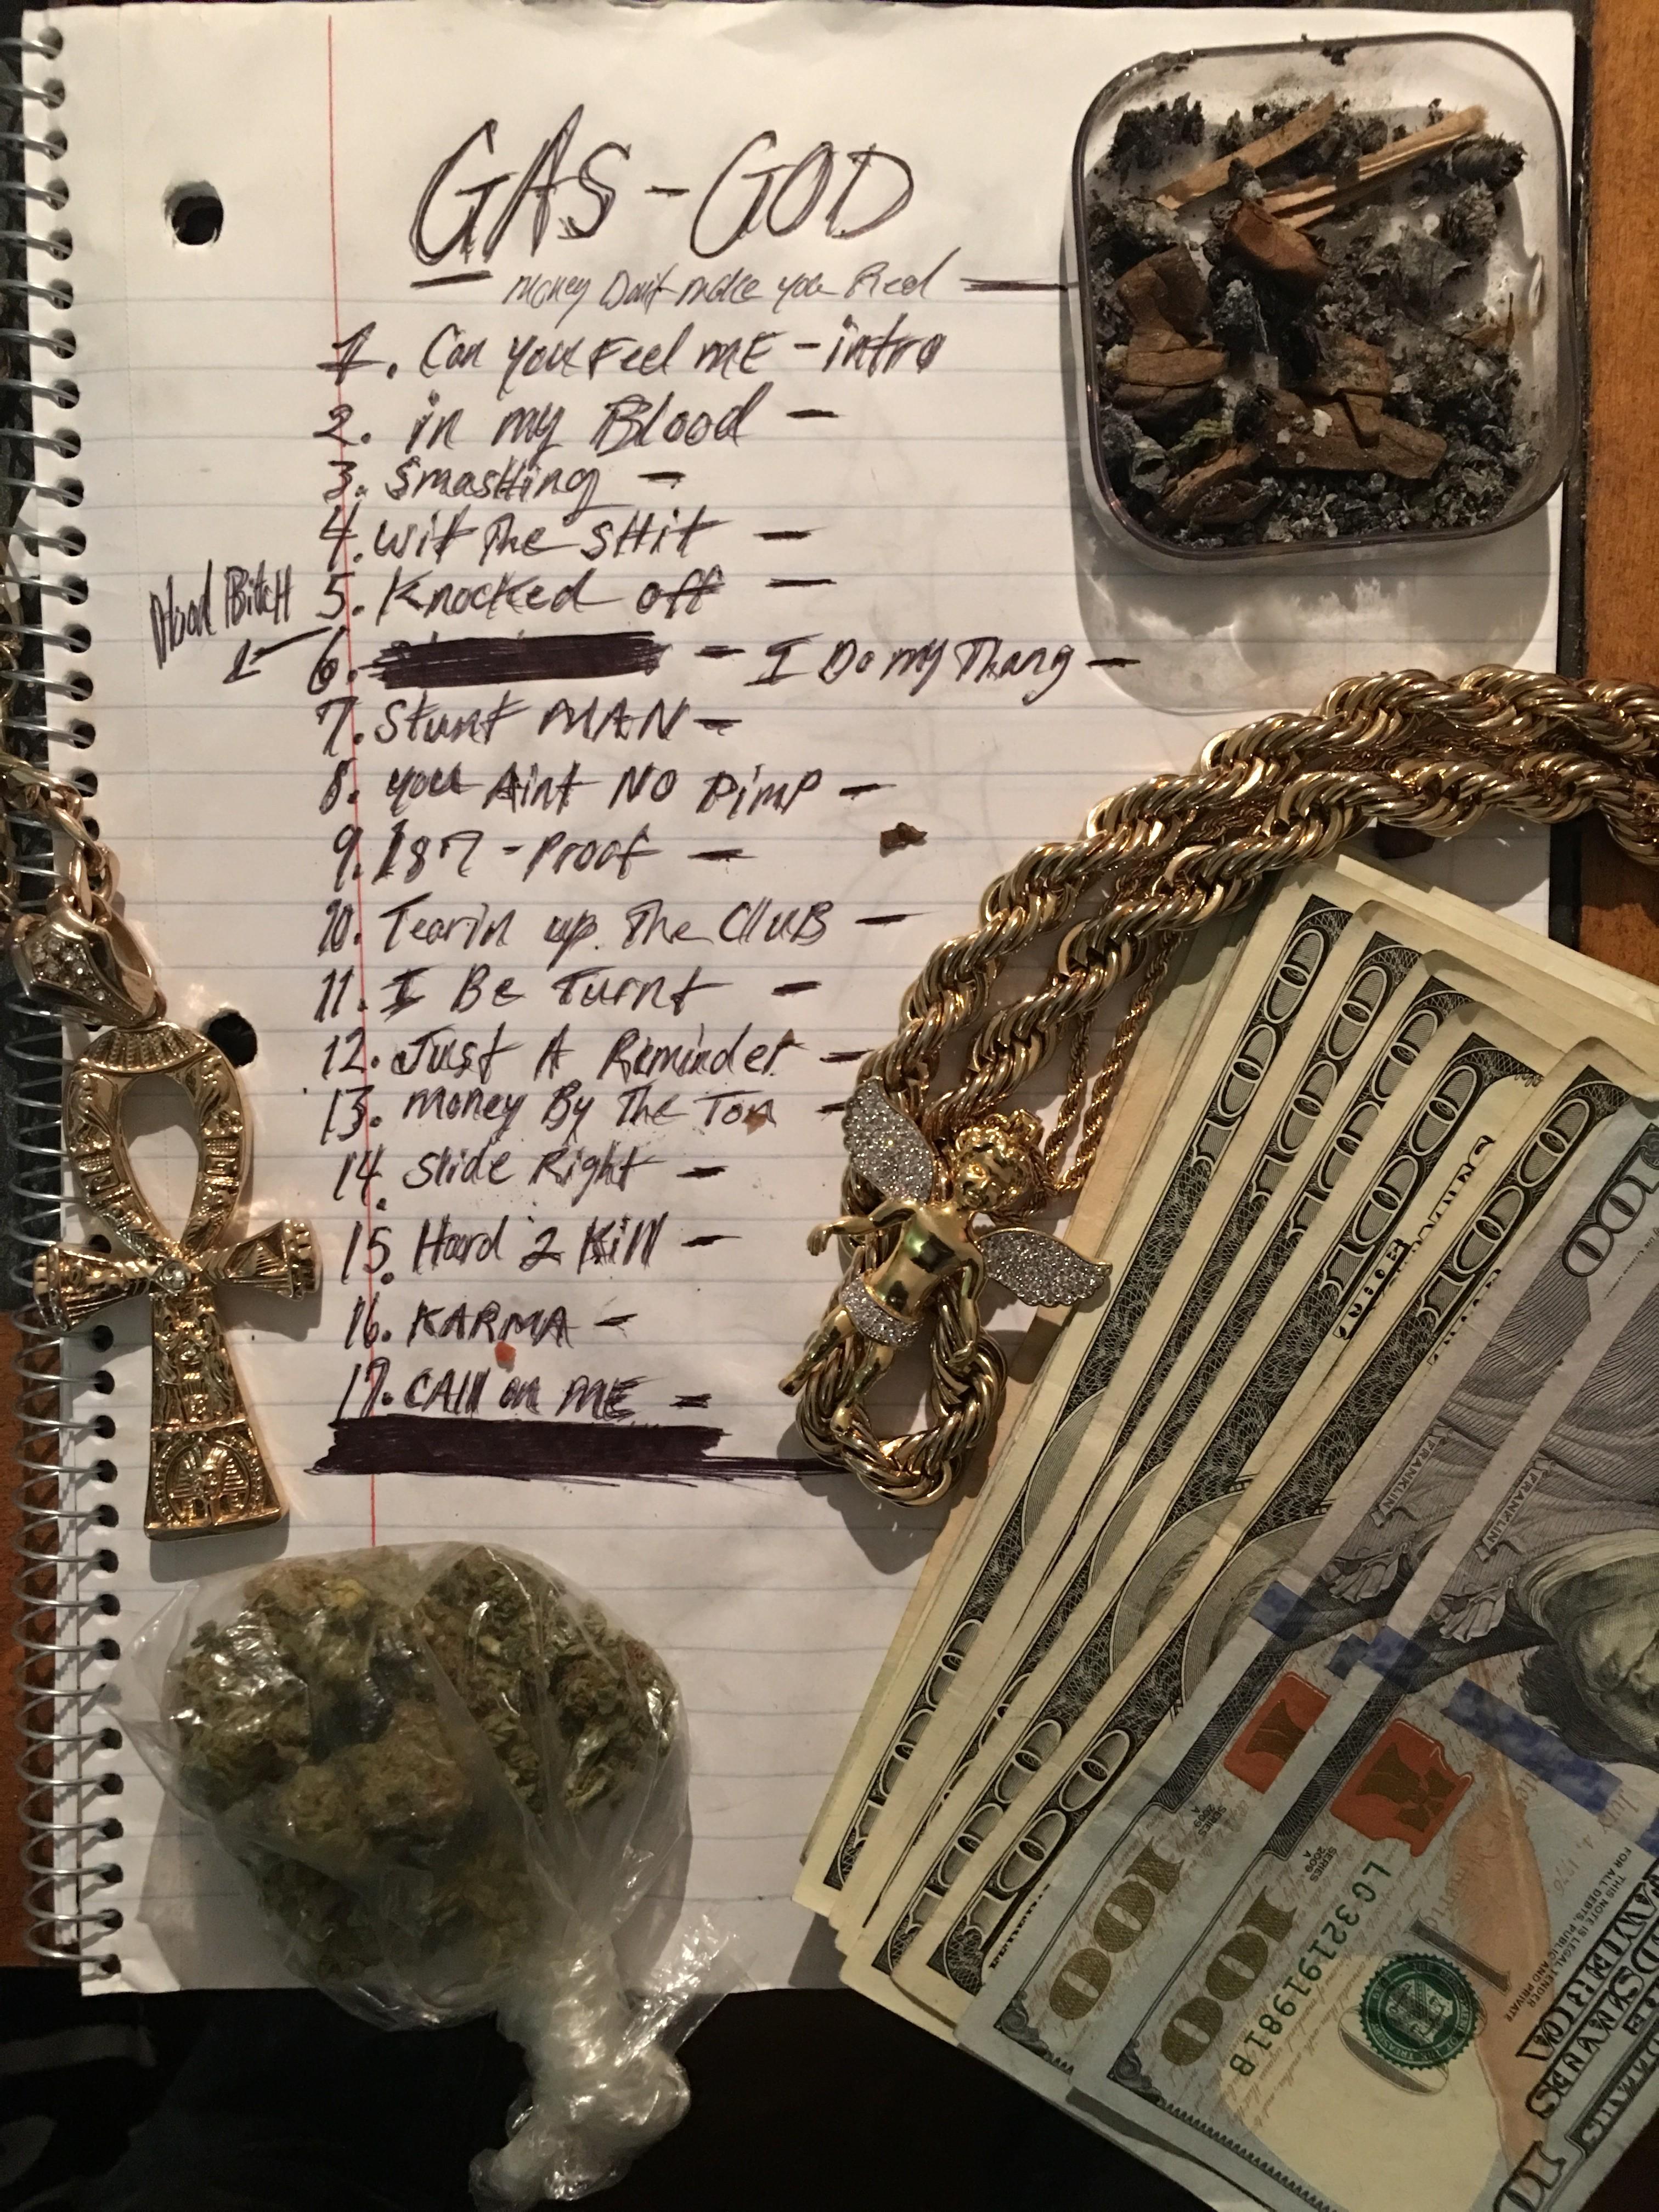 gasgod track list